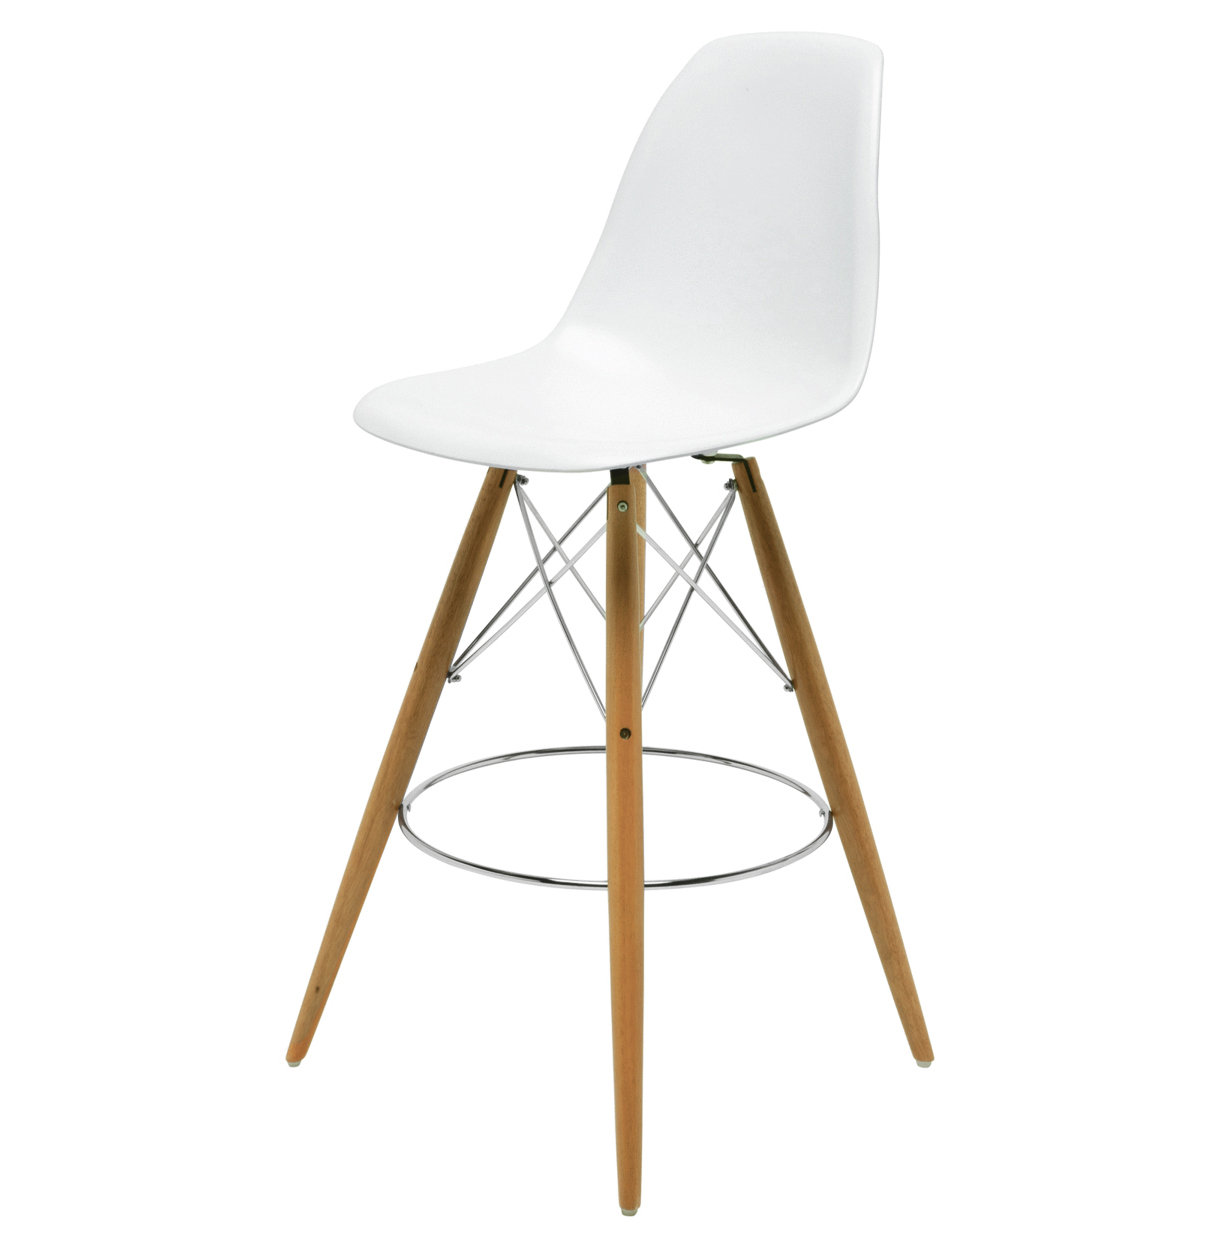 Eiffel Reproduction White Plastic Oak Wood Modern Barstool - Pair